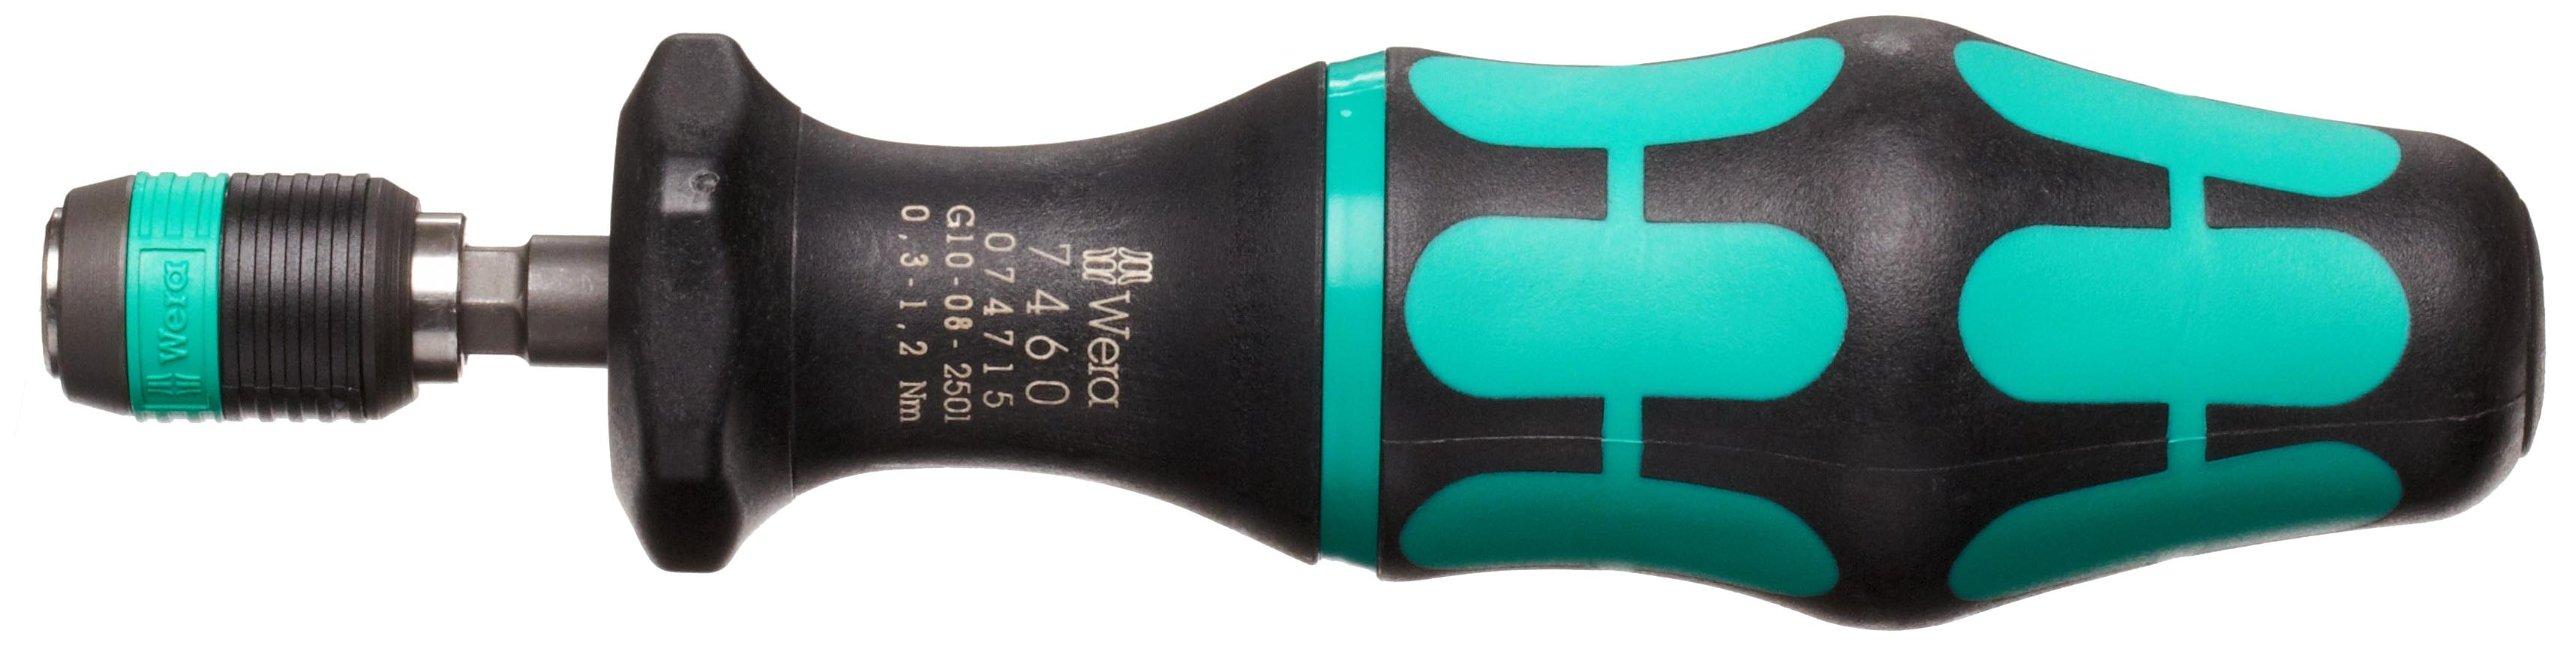 Wera 05074715001 Kraftform 7460 Hexagon Torque Screwdriver, 1/4'' Head, 0.3-1.2 Nm Pre-Set Adjustable Torque Range